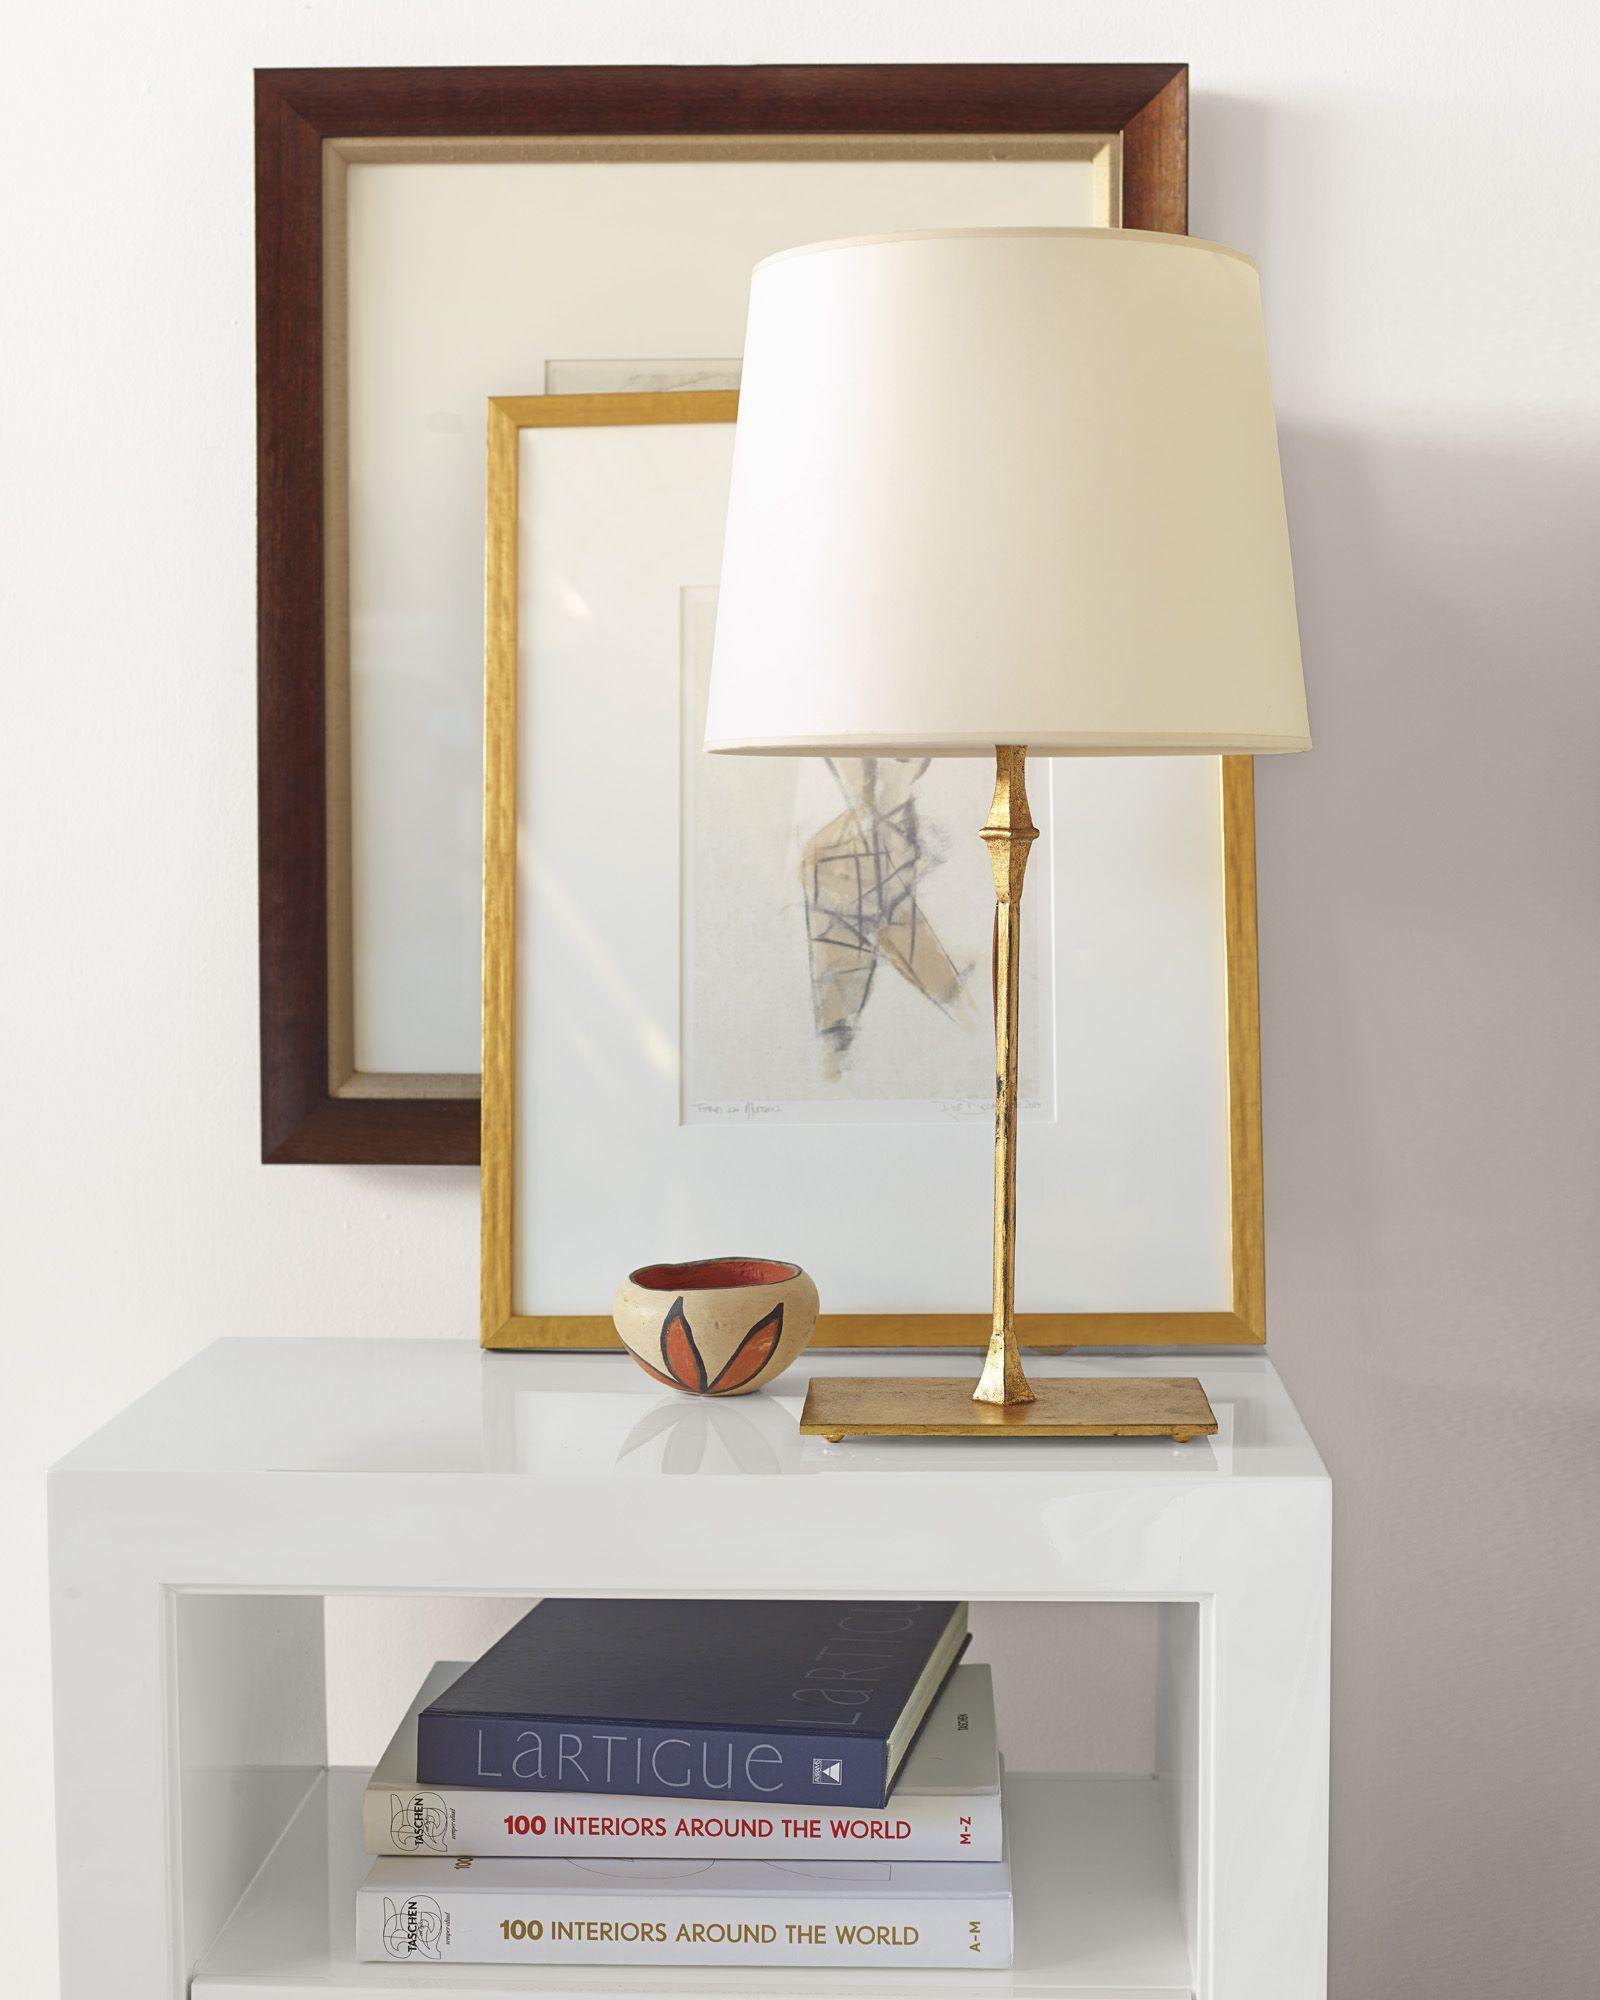 Dauphine Table Lamp Serena & Lily Table lamp, Coastal